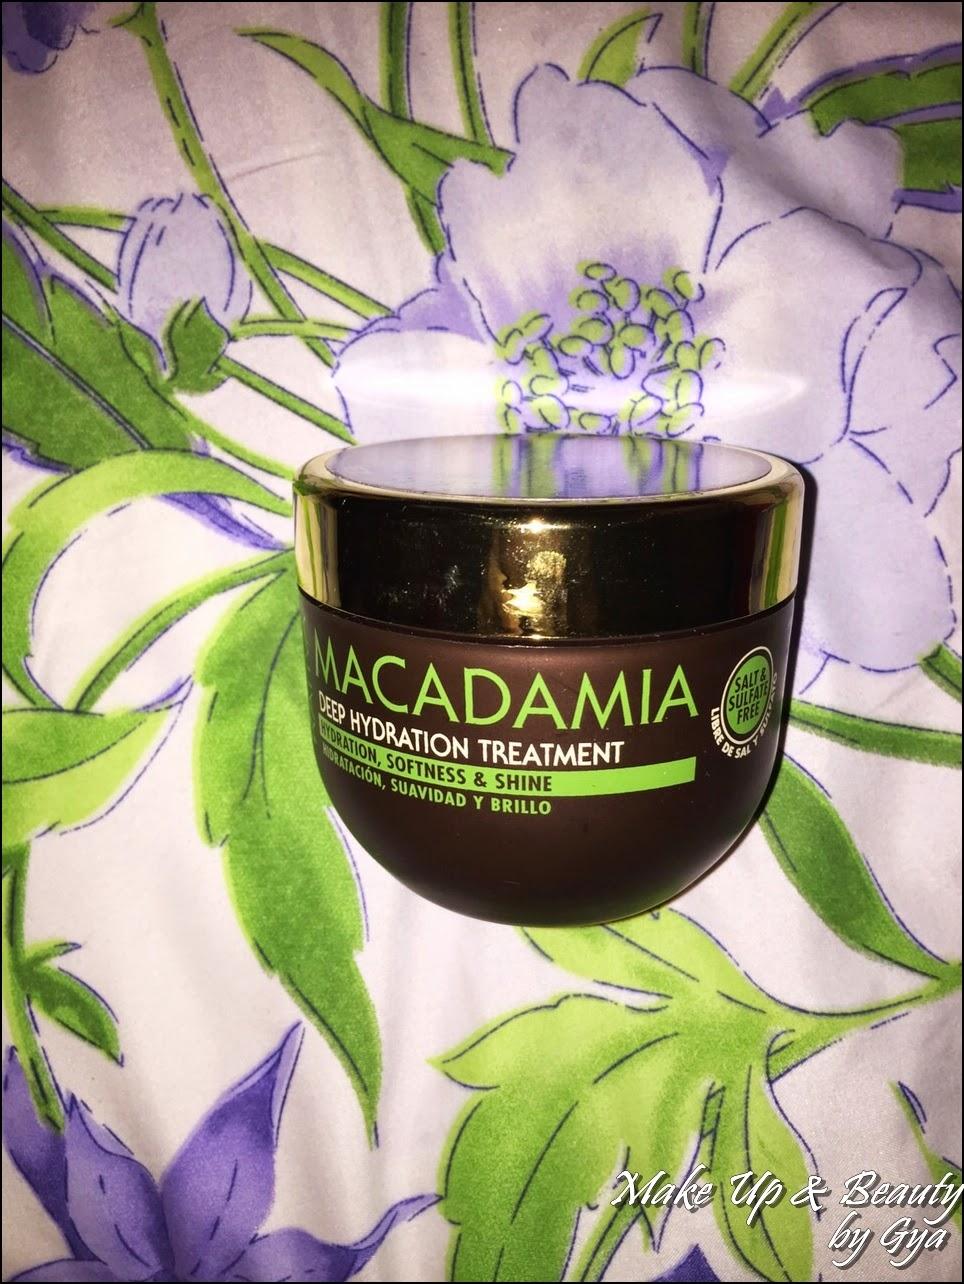 Tratamiento capilar con Macadamia Kativa